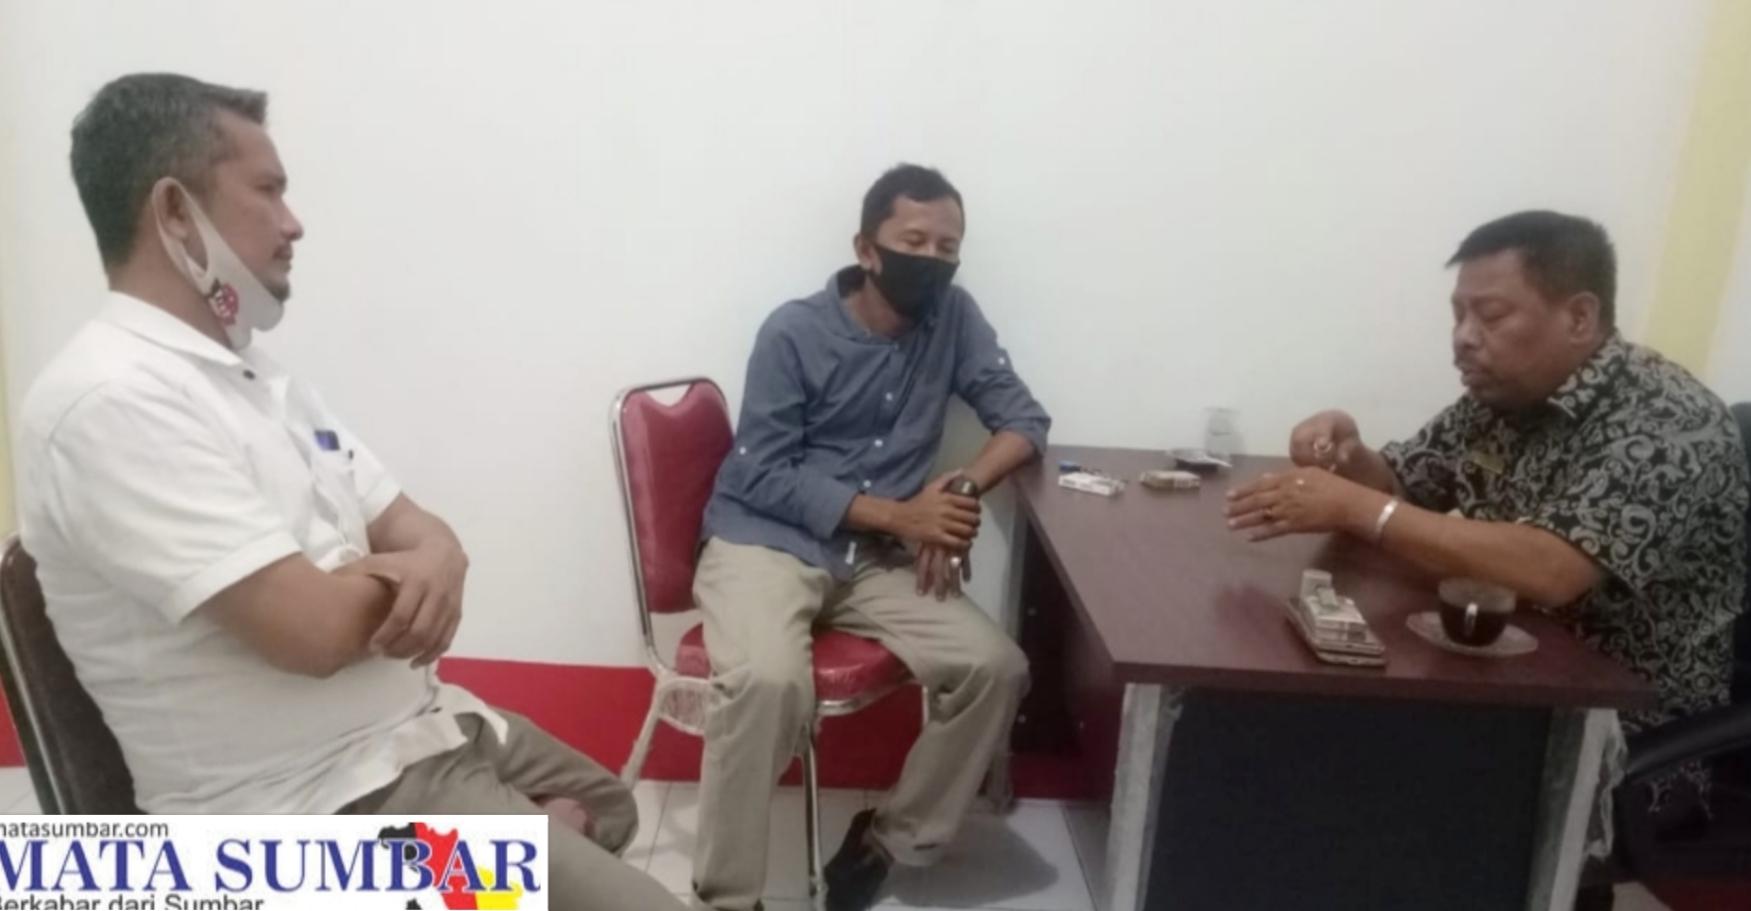 Ketua DPRD Pasbar Mengutuk Keras Aksi Bom Bunuh Diri di Kota Makassar